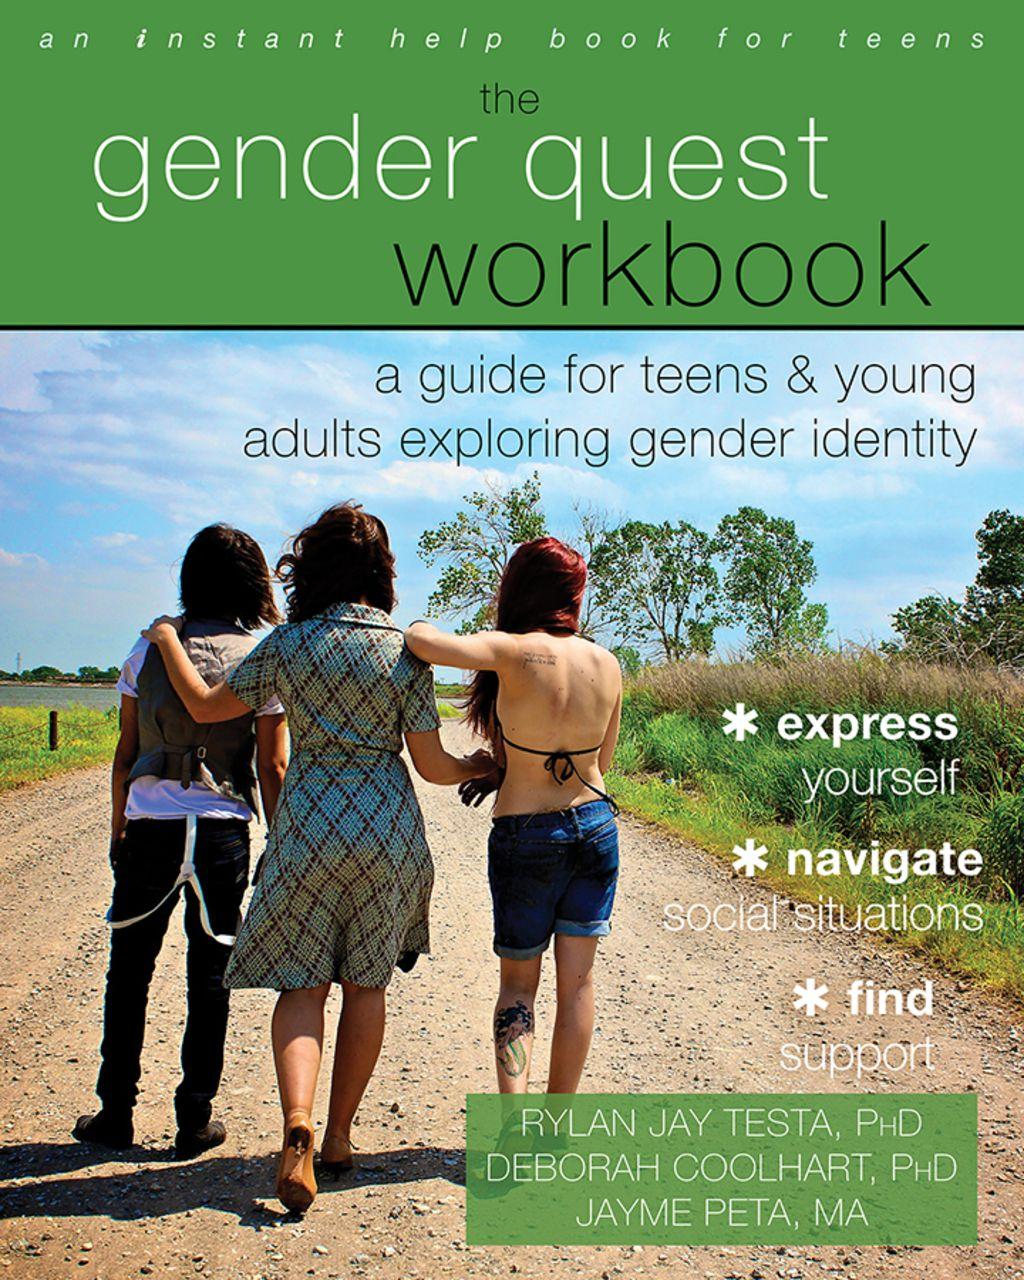 The Gender Quest Workbook Ebook